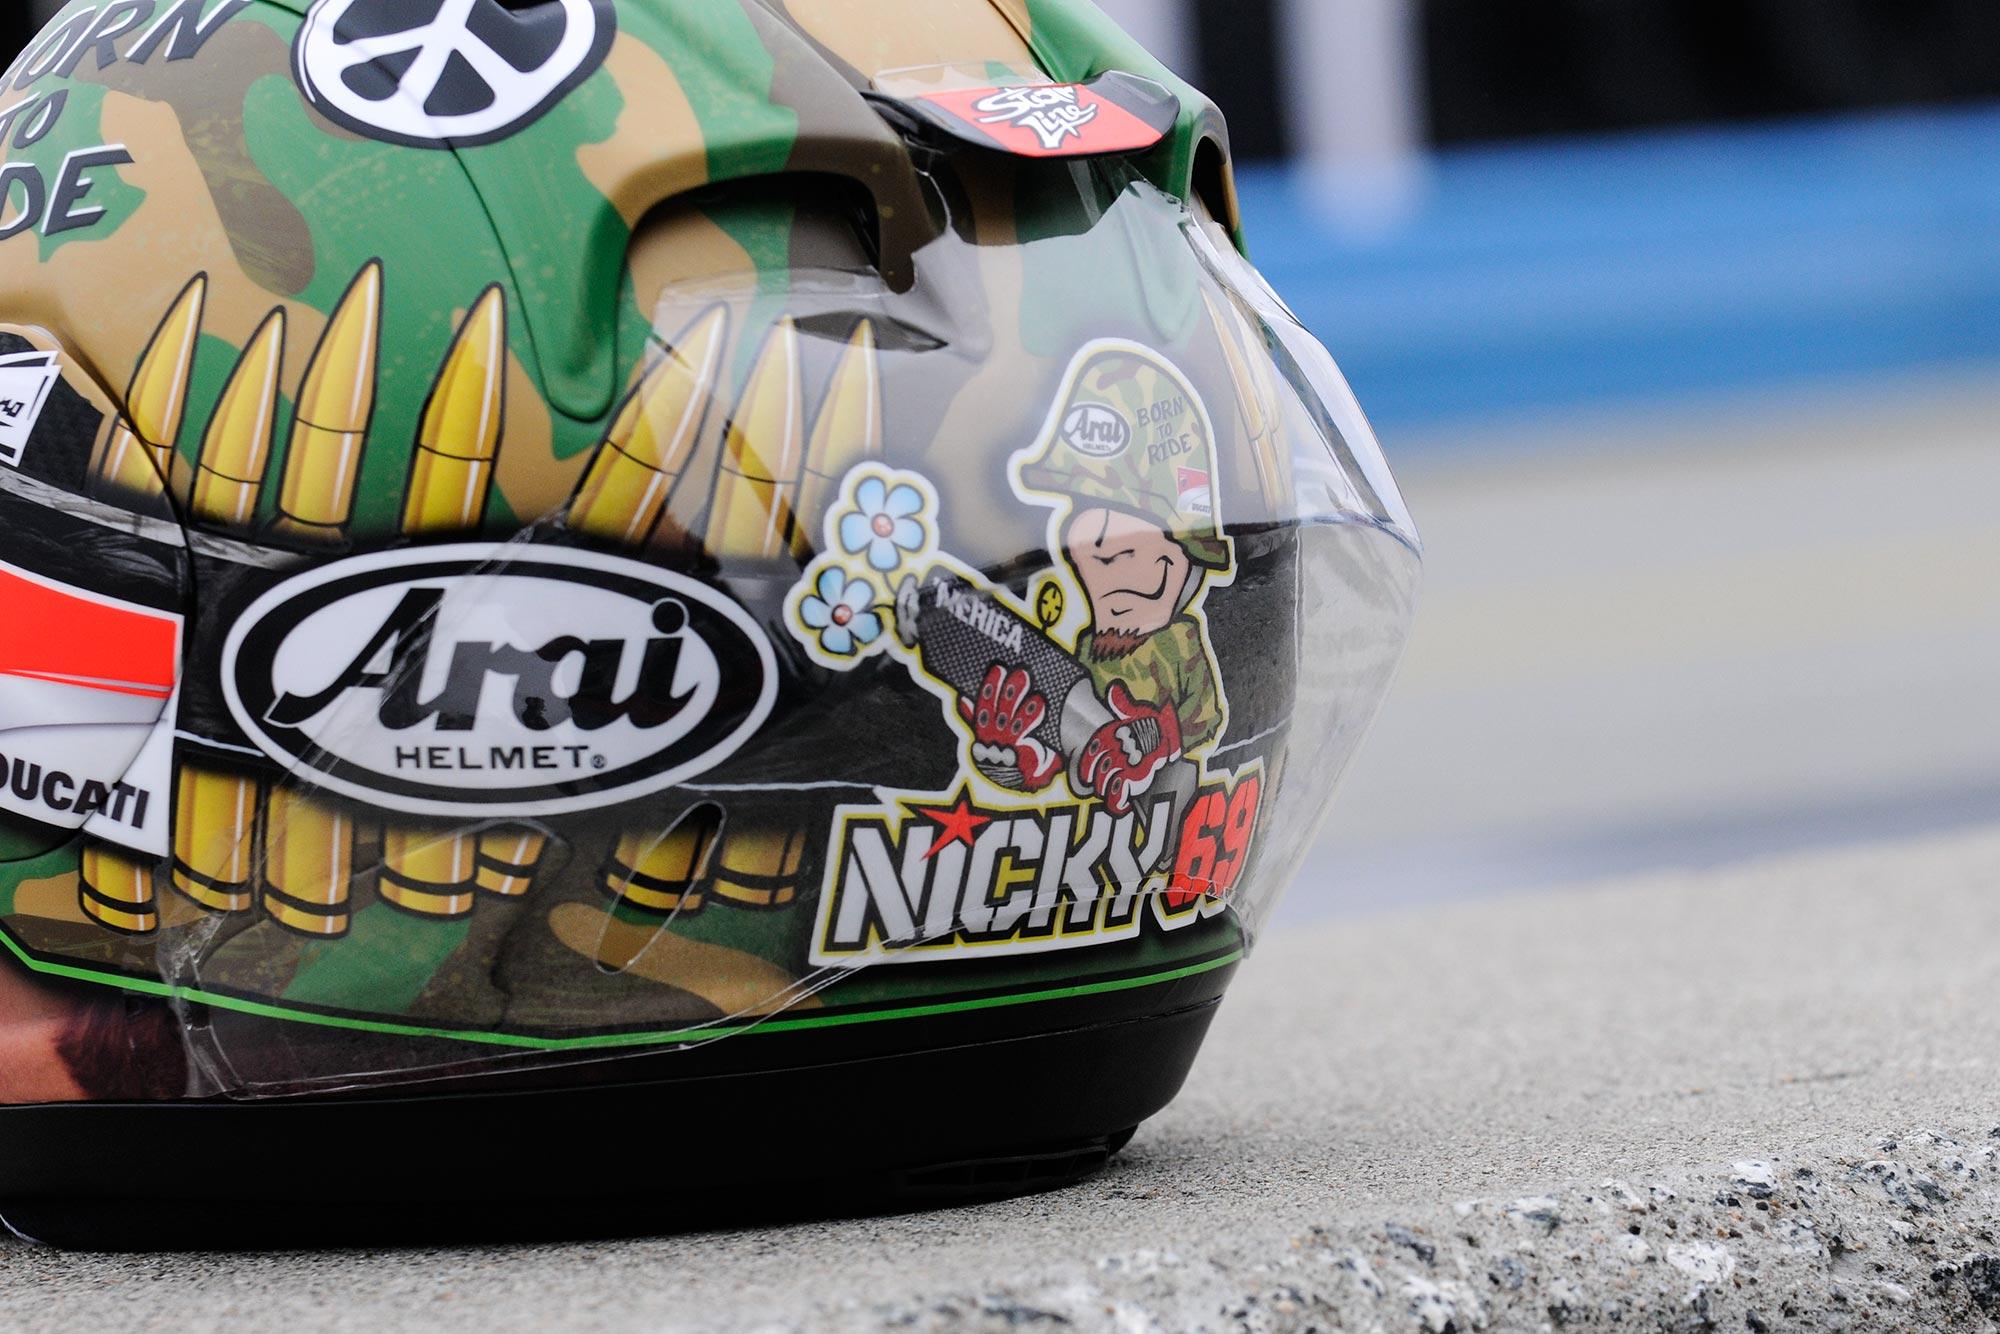 Photos: Nicky Hayden's Laguna Seca Helmet - Asphalt & Rubber